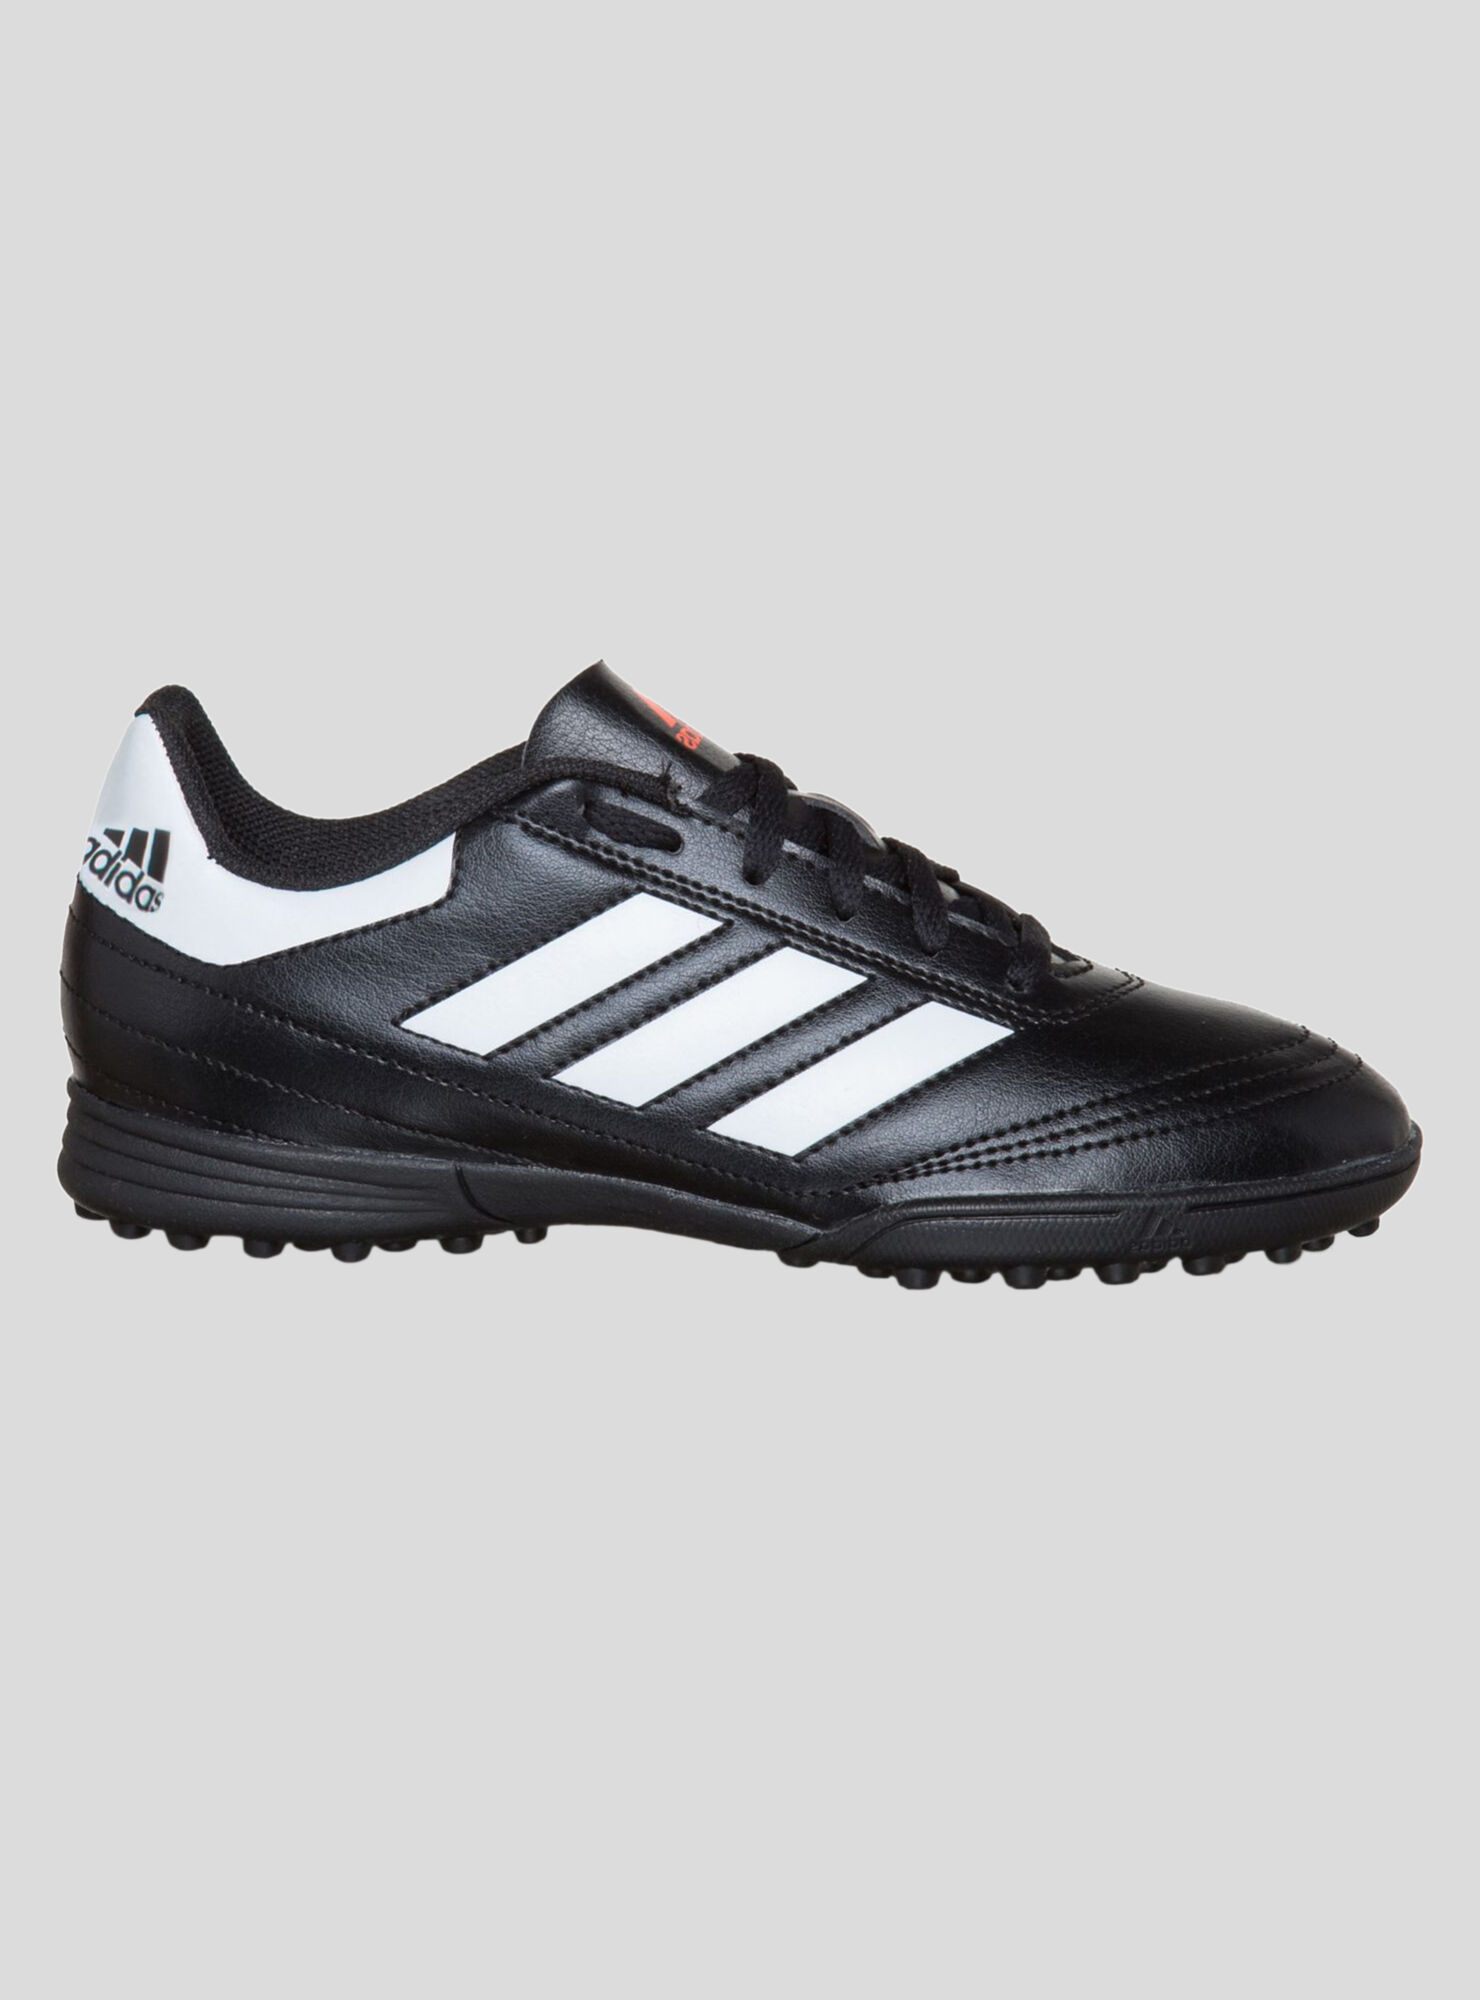 18214b6c0c4ff Zapatilla Adidas Goletto VI Fútbol Niño - Zapatillas